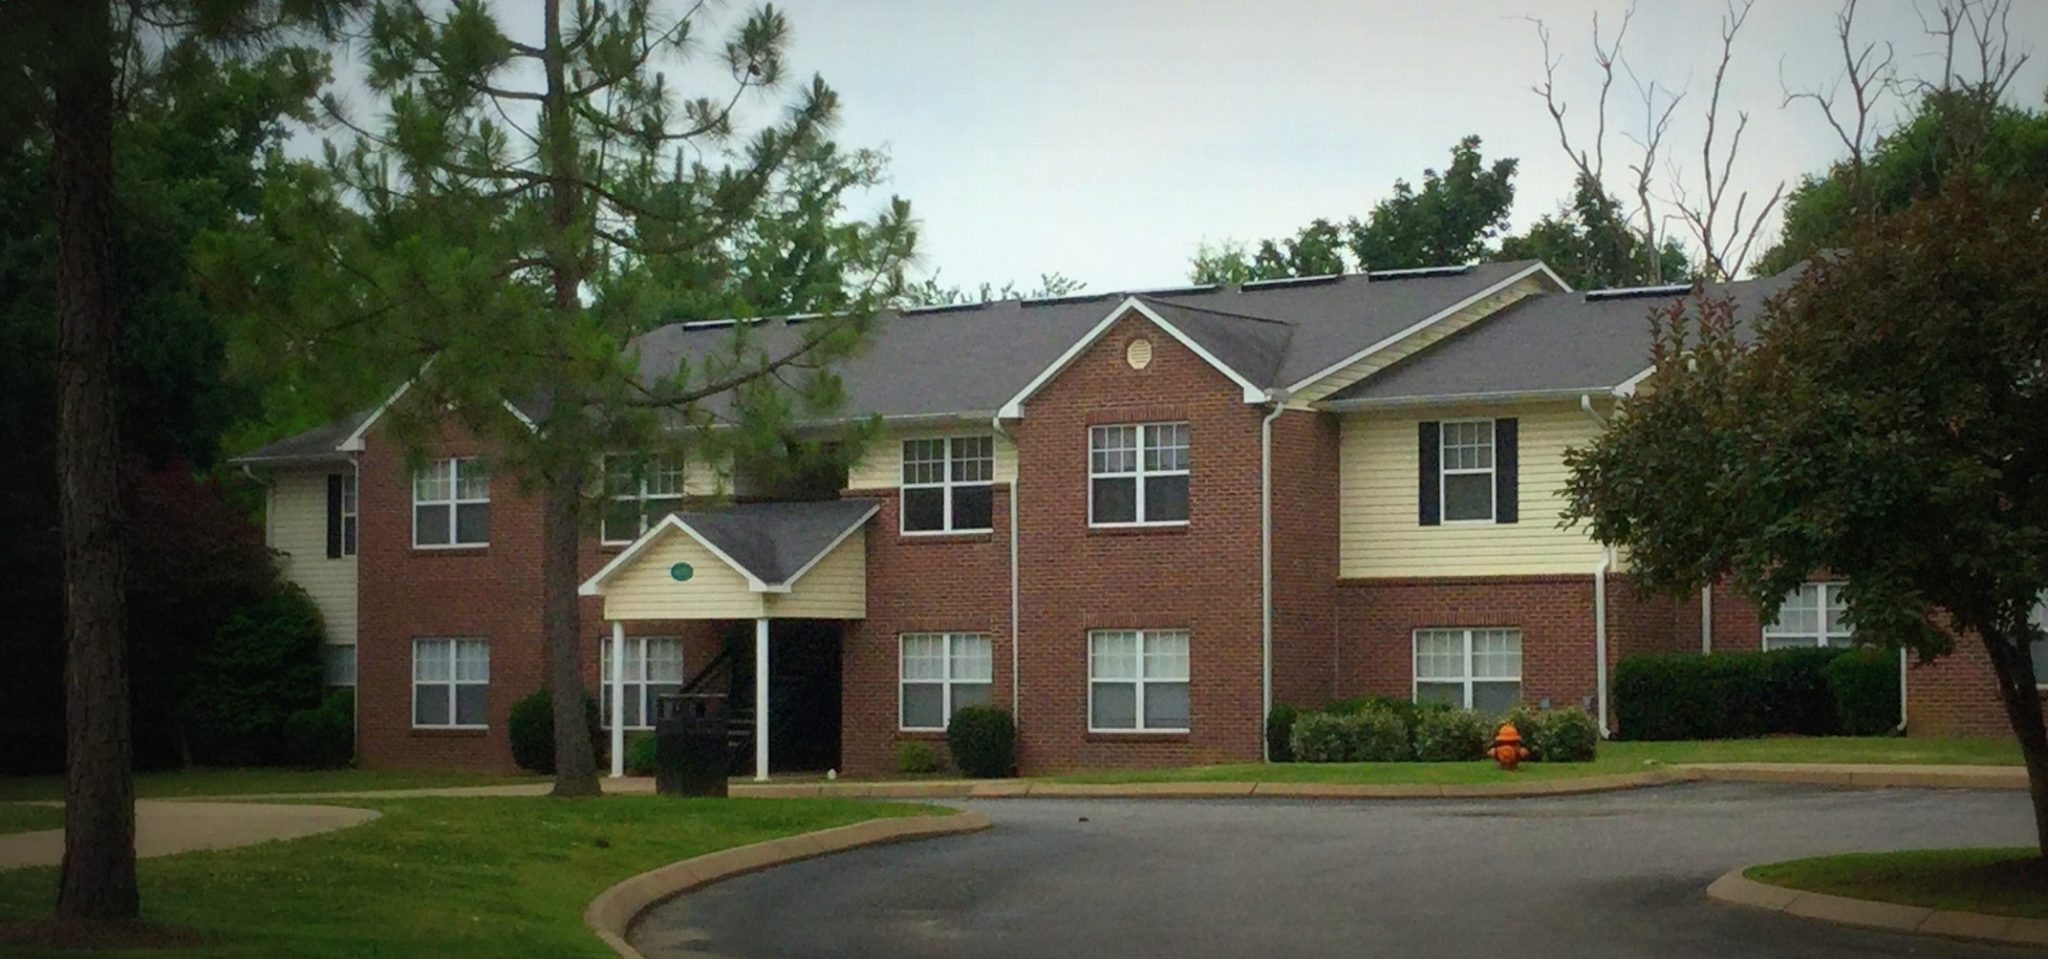 Riverbrook,Brownsville,Tn Property1